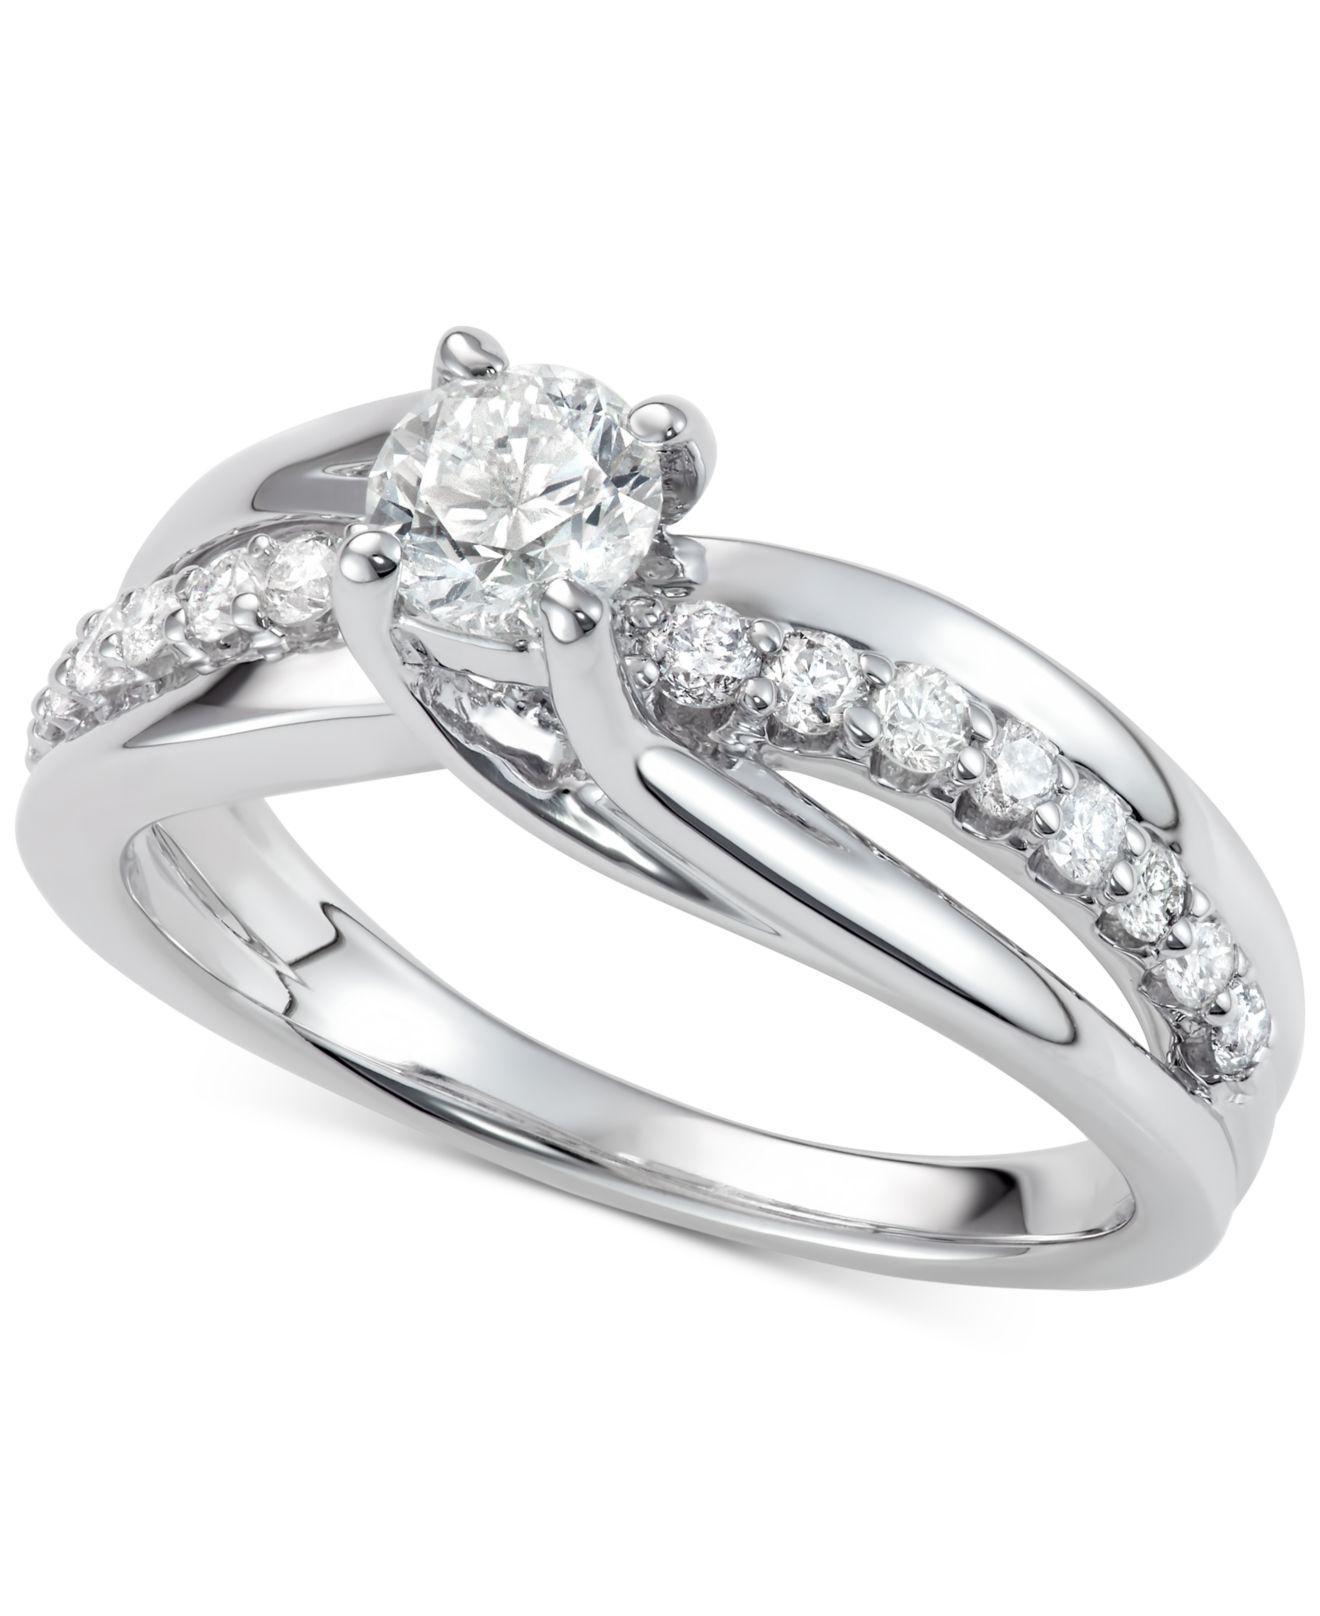 Macys Wedding Rings   Lyst Macy S Diamond Elevated Twist Engagement Ring 7 8 Ct T W